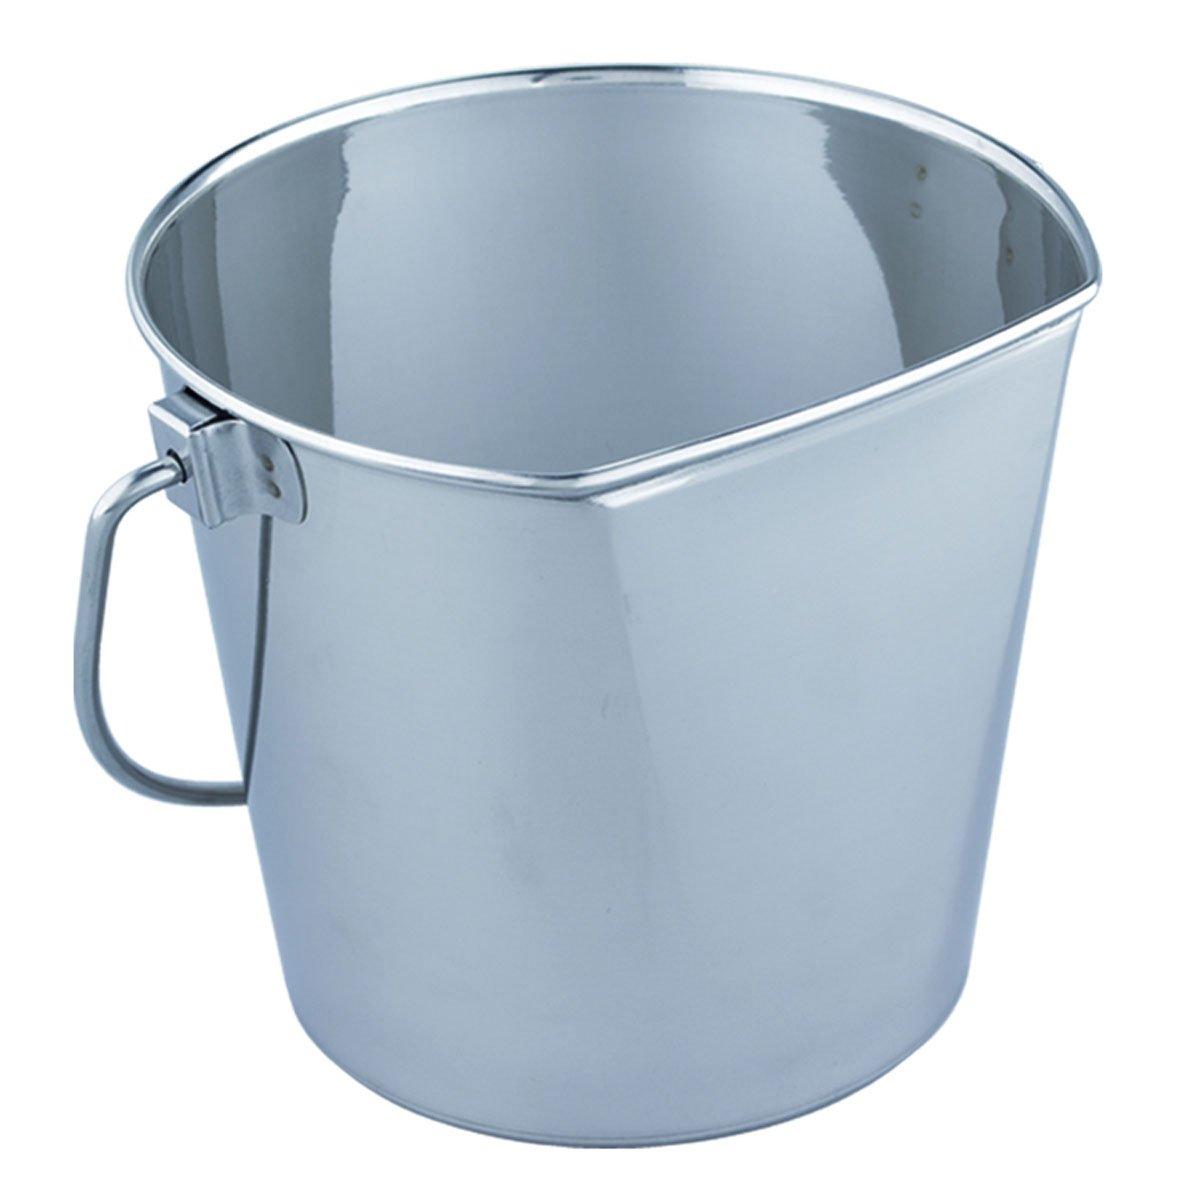 QT Dog Flat Sided Stainless Steel Bucket, 2 Quart